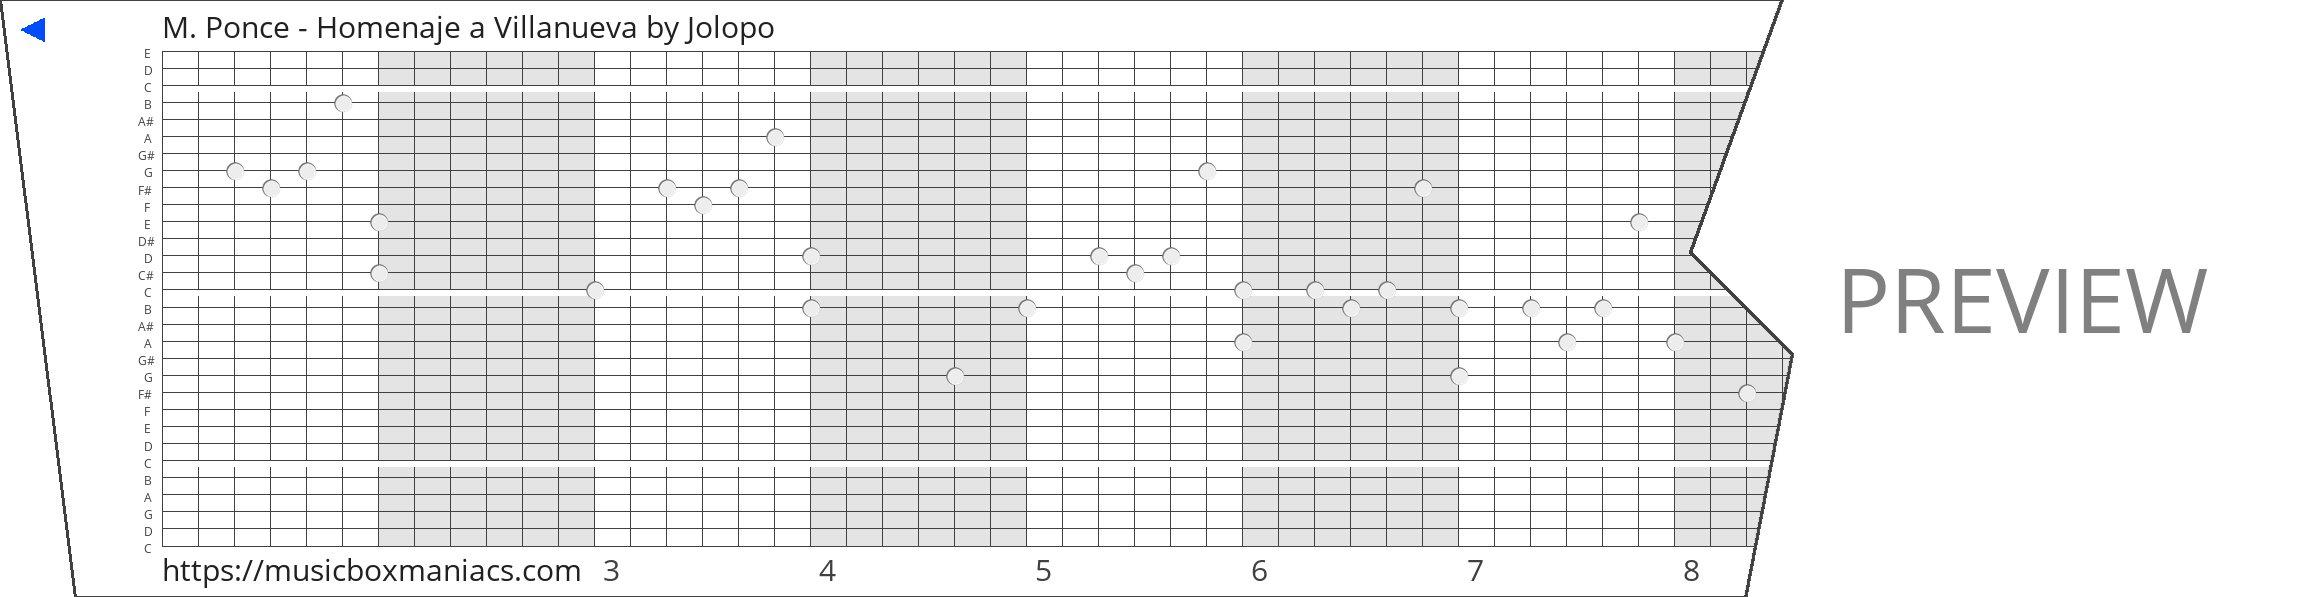 M. Ponce - Homenaje a Villanueva 30 note music box paper strip